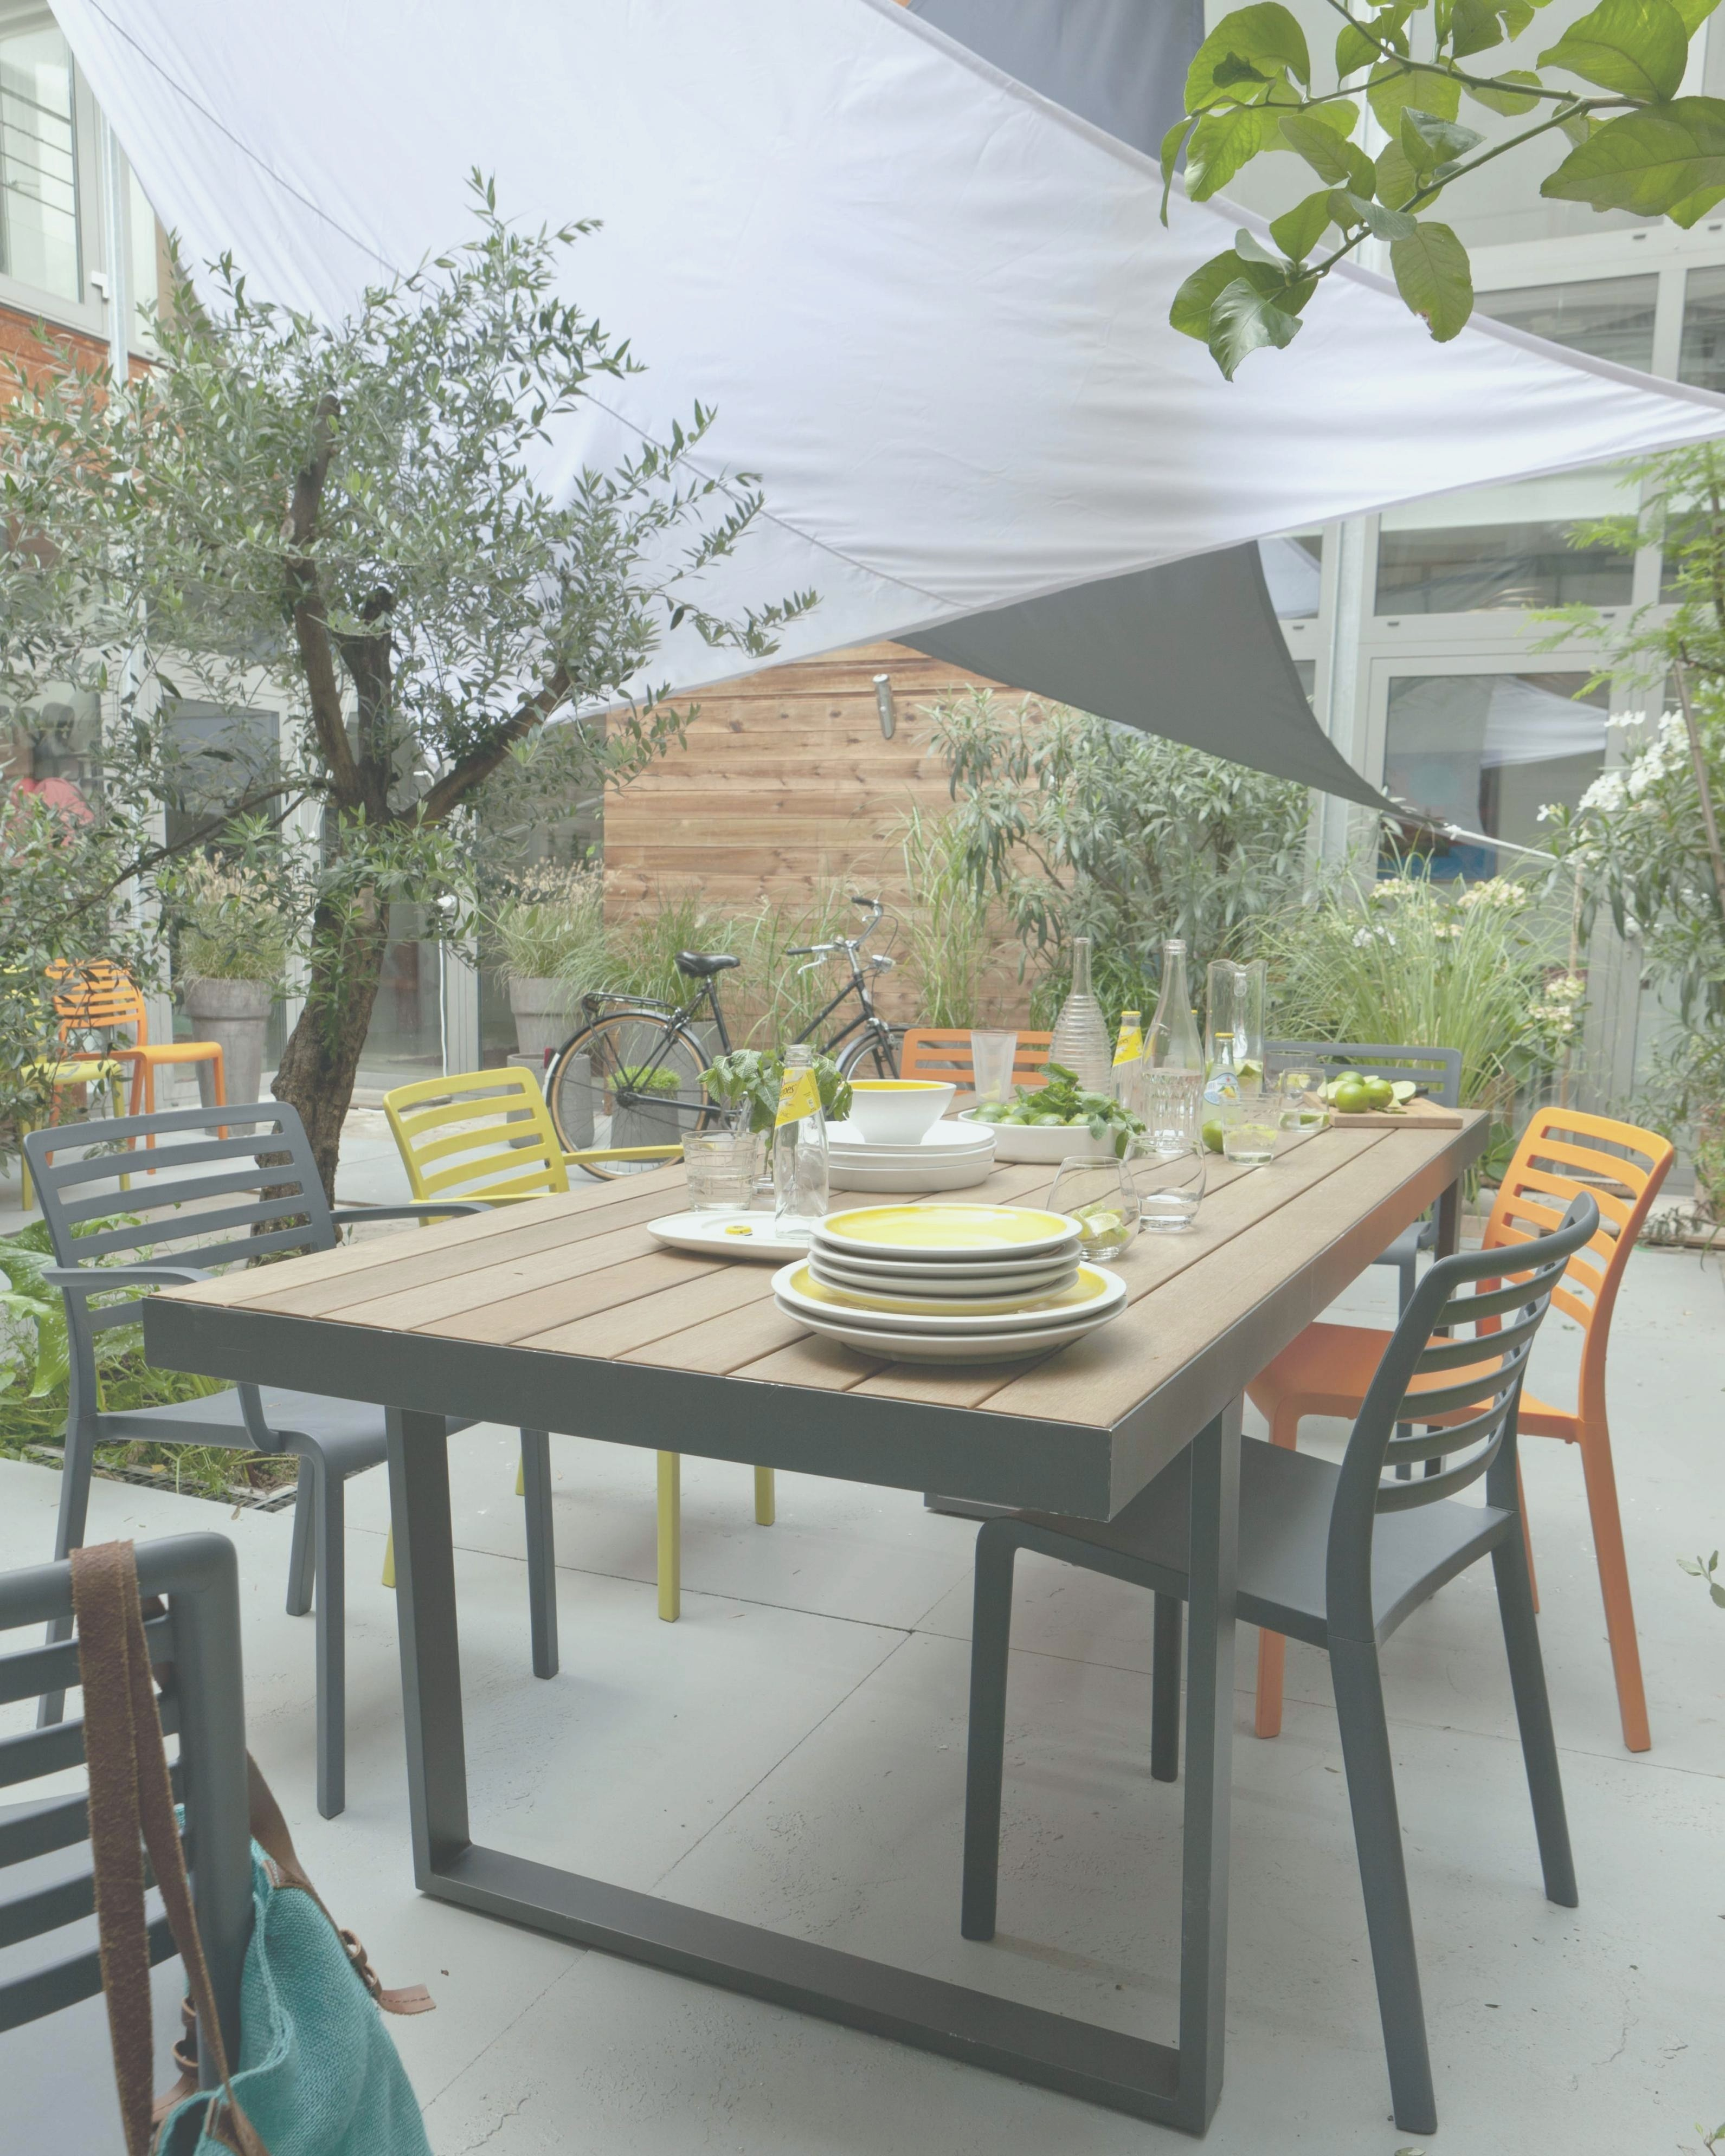 Salon De Jardin Leroy Merlin 2017 Nouveau Stock 20 Luxe Table De Jardin En Aluminium Décoration Unique solde Salon